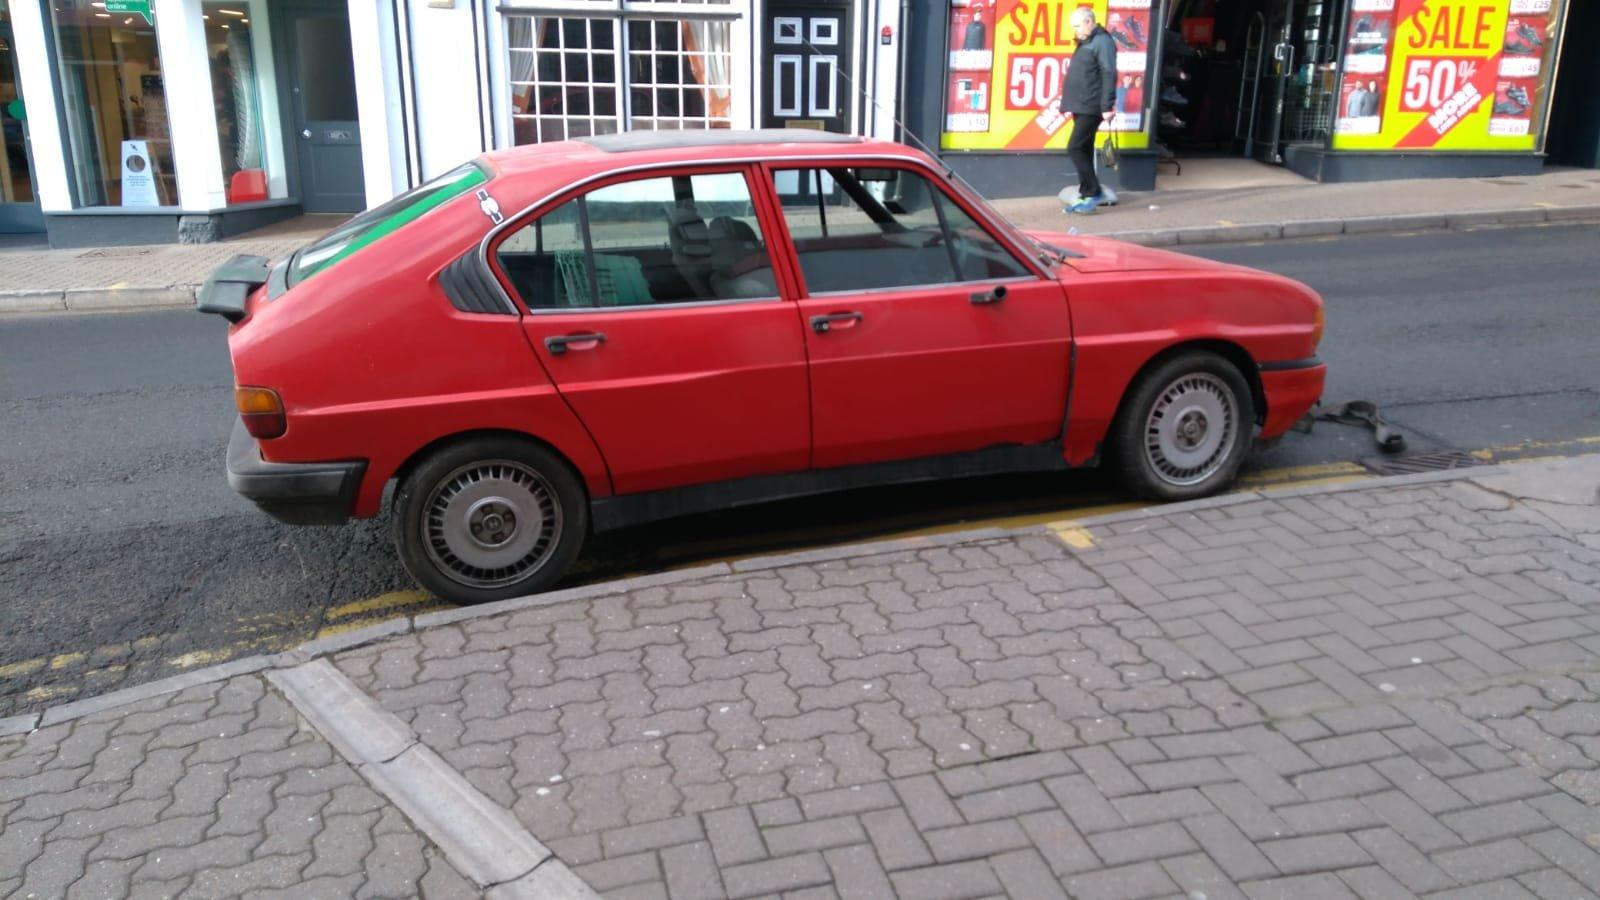 1983 Alfa Romeo Alfasud project For Sale (picture 3 of 3)